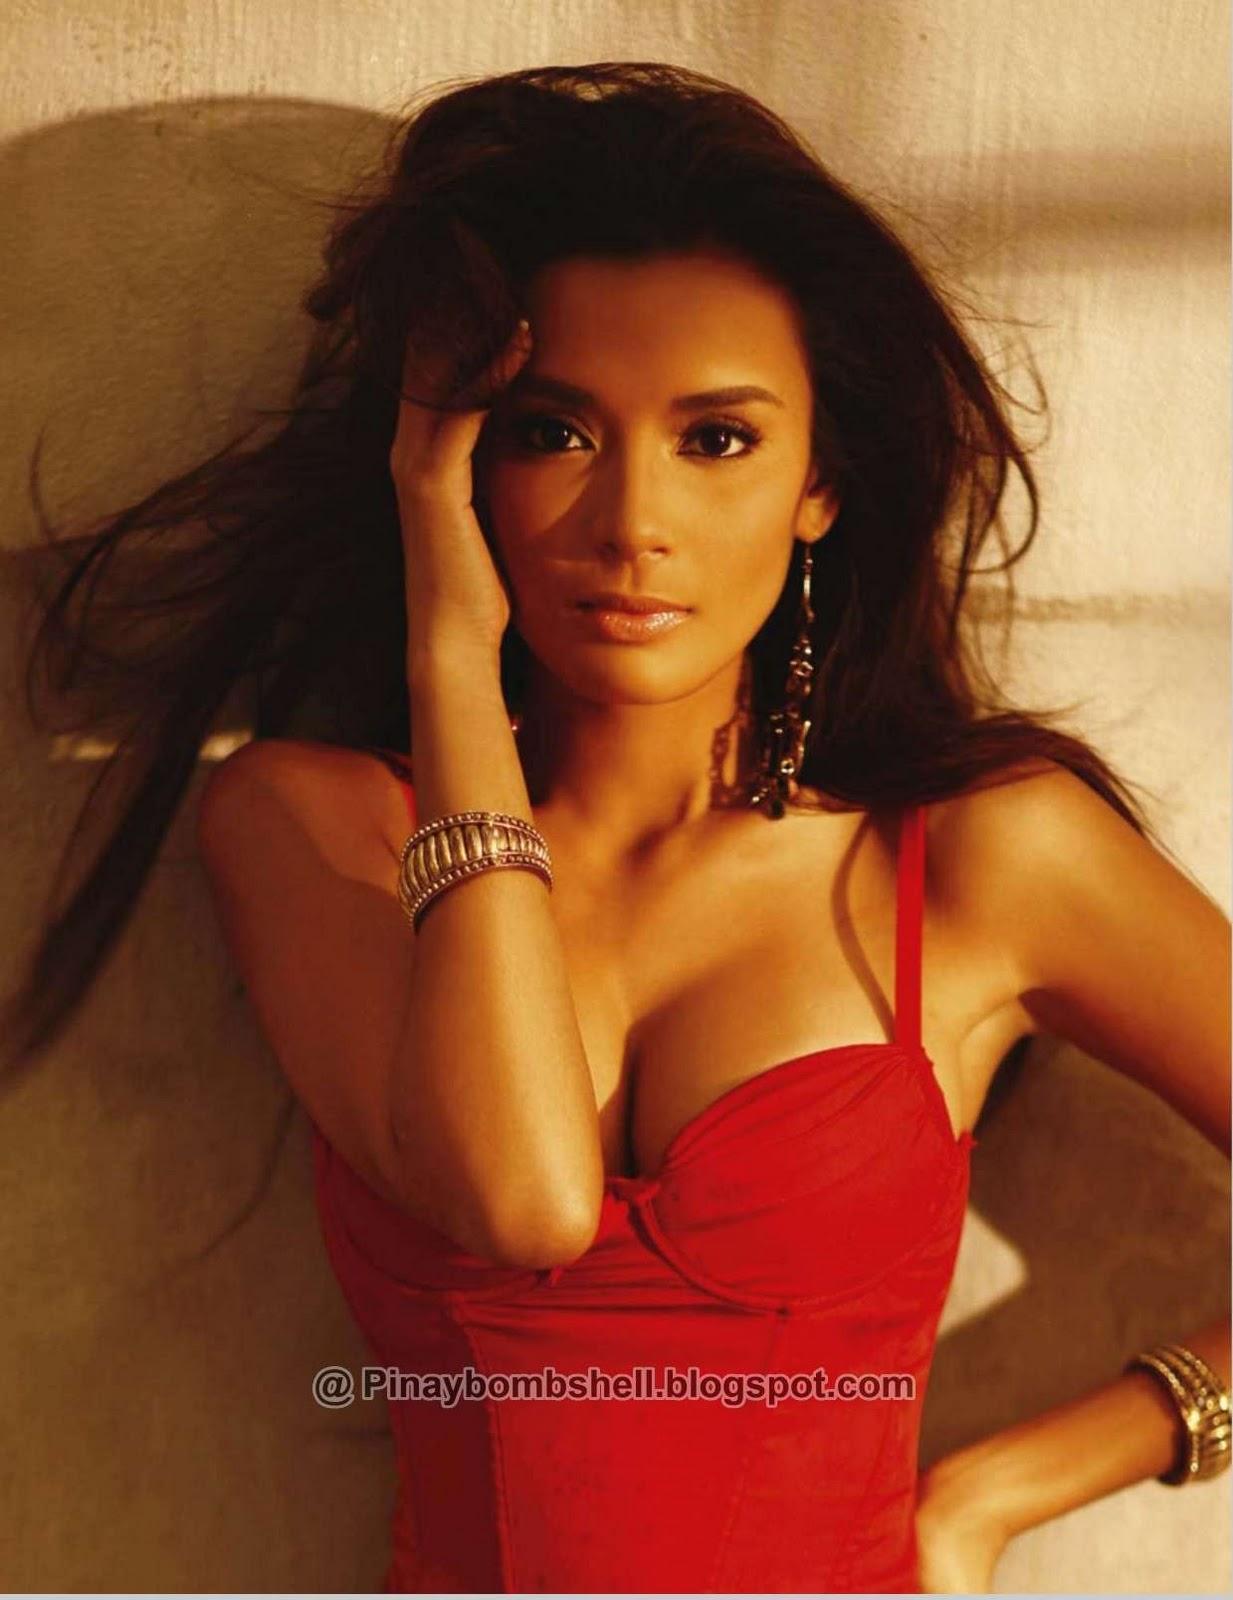 http://3.bp.blogspot.com/_AeKi9w_14XM/TTlapjaU2mI/AAAAAAAAAHg/kSzaOs9HldU/s1600/FHM+Philippines+November+2010+Michelle+and+Ehra+Madrigal_Page_058wtmk.jpg